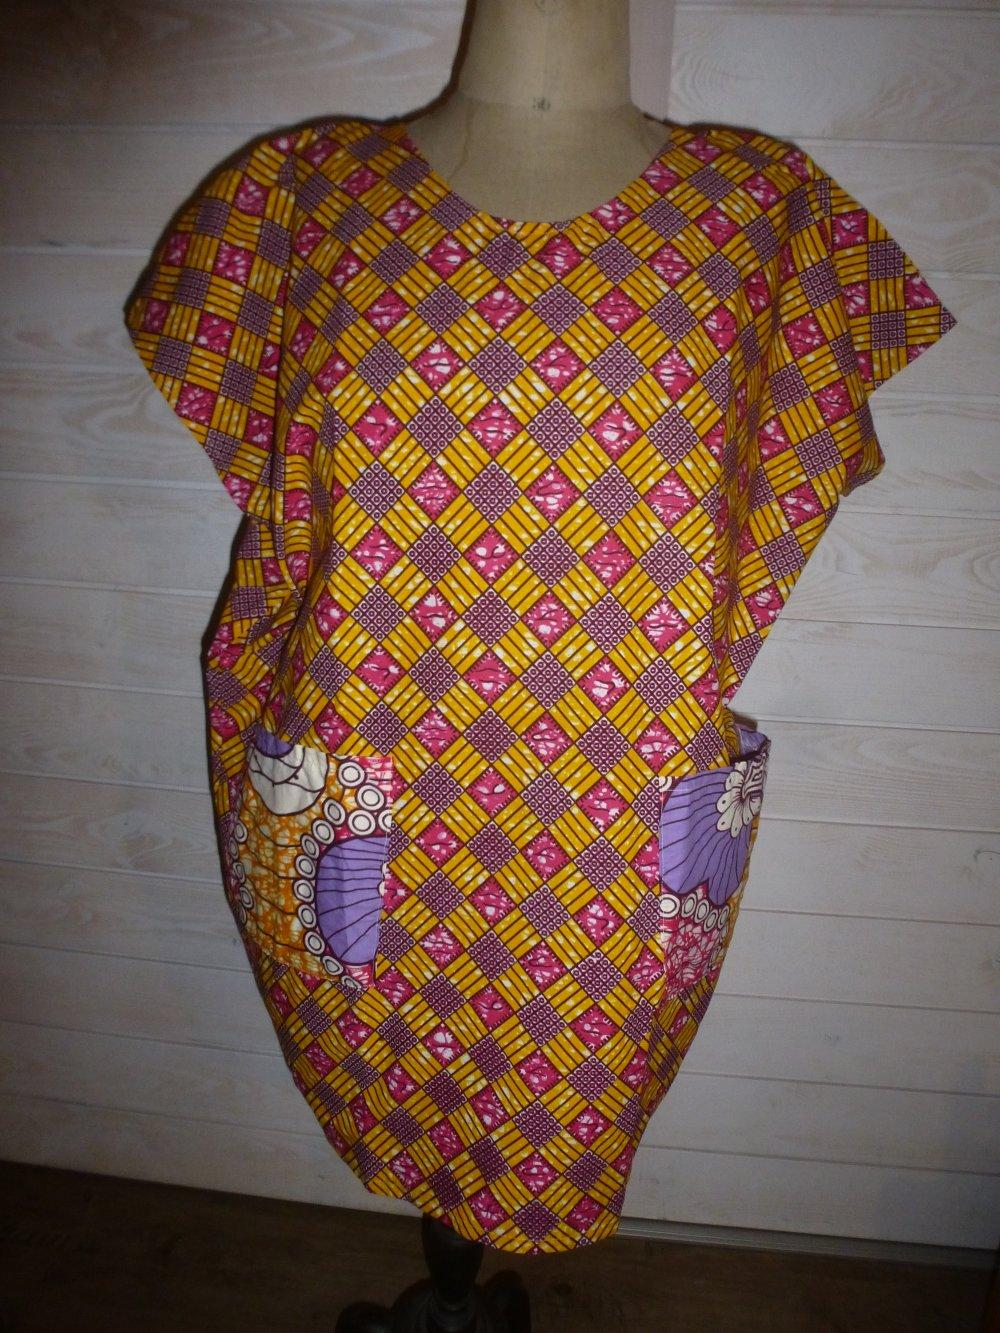 ROBE TUNIQUE COTON TISSU AFRICAIN WAX ETHNIQUE TAILLE 44 A 52 PIECE UNIQUE